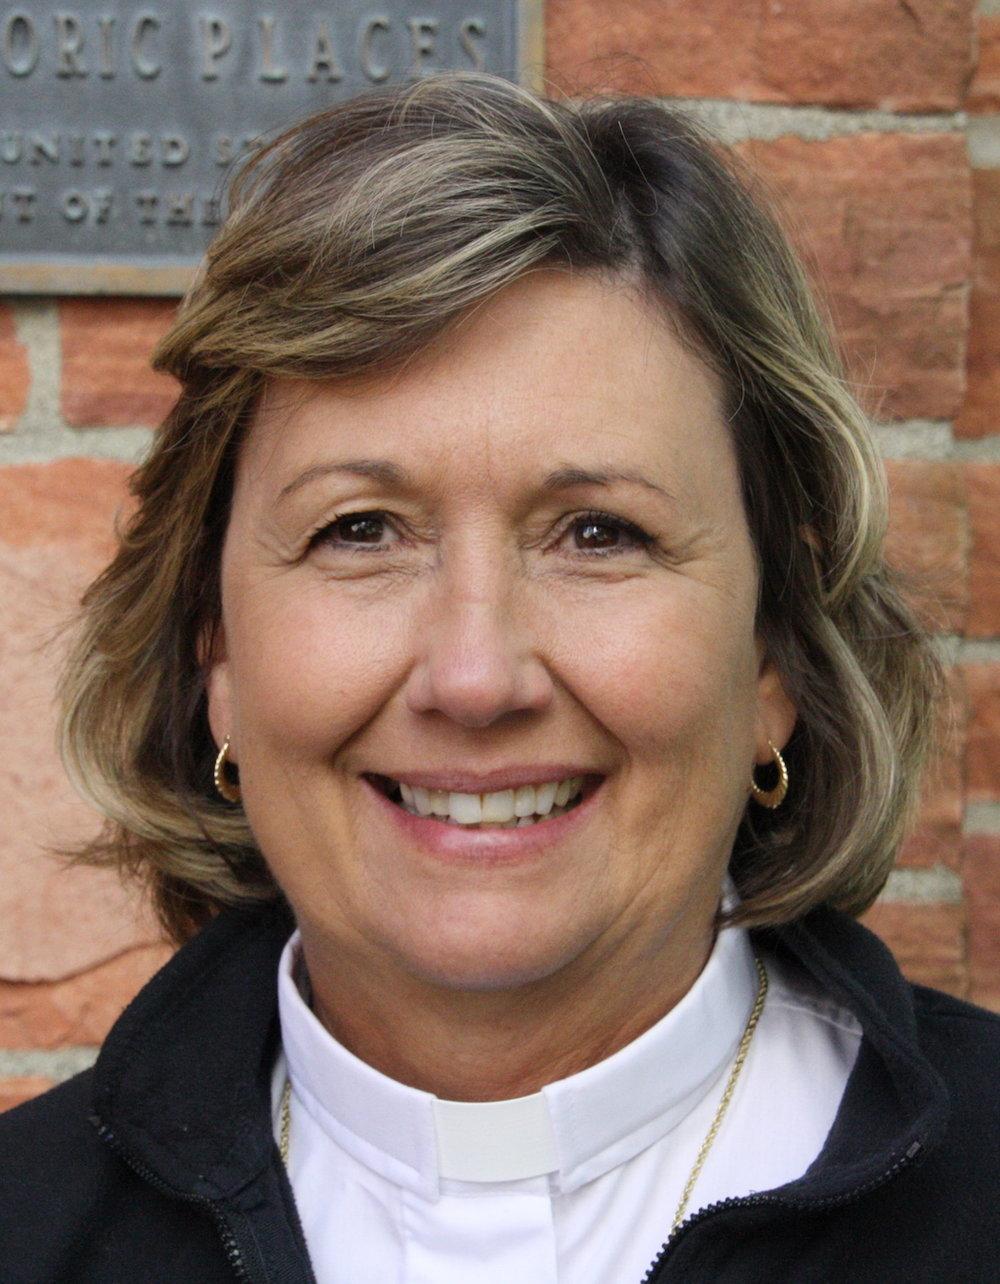 The Rev. Susan Plaske